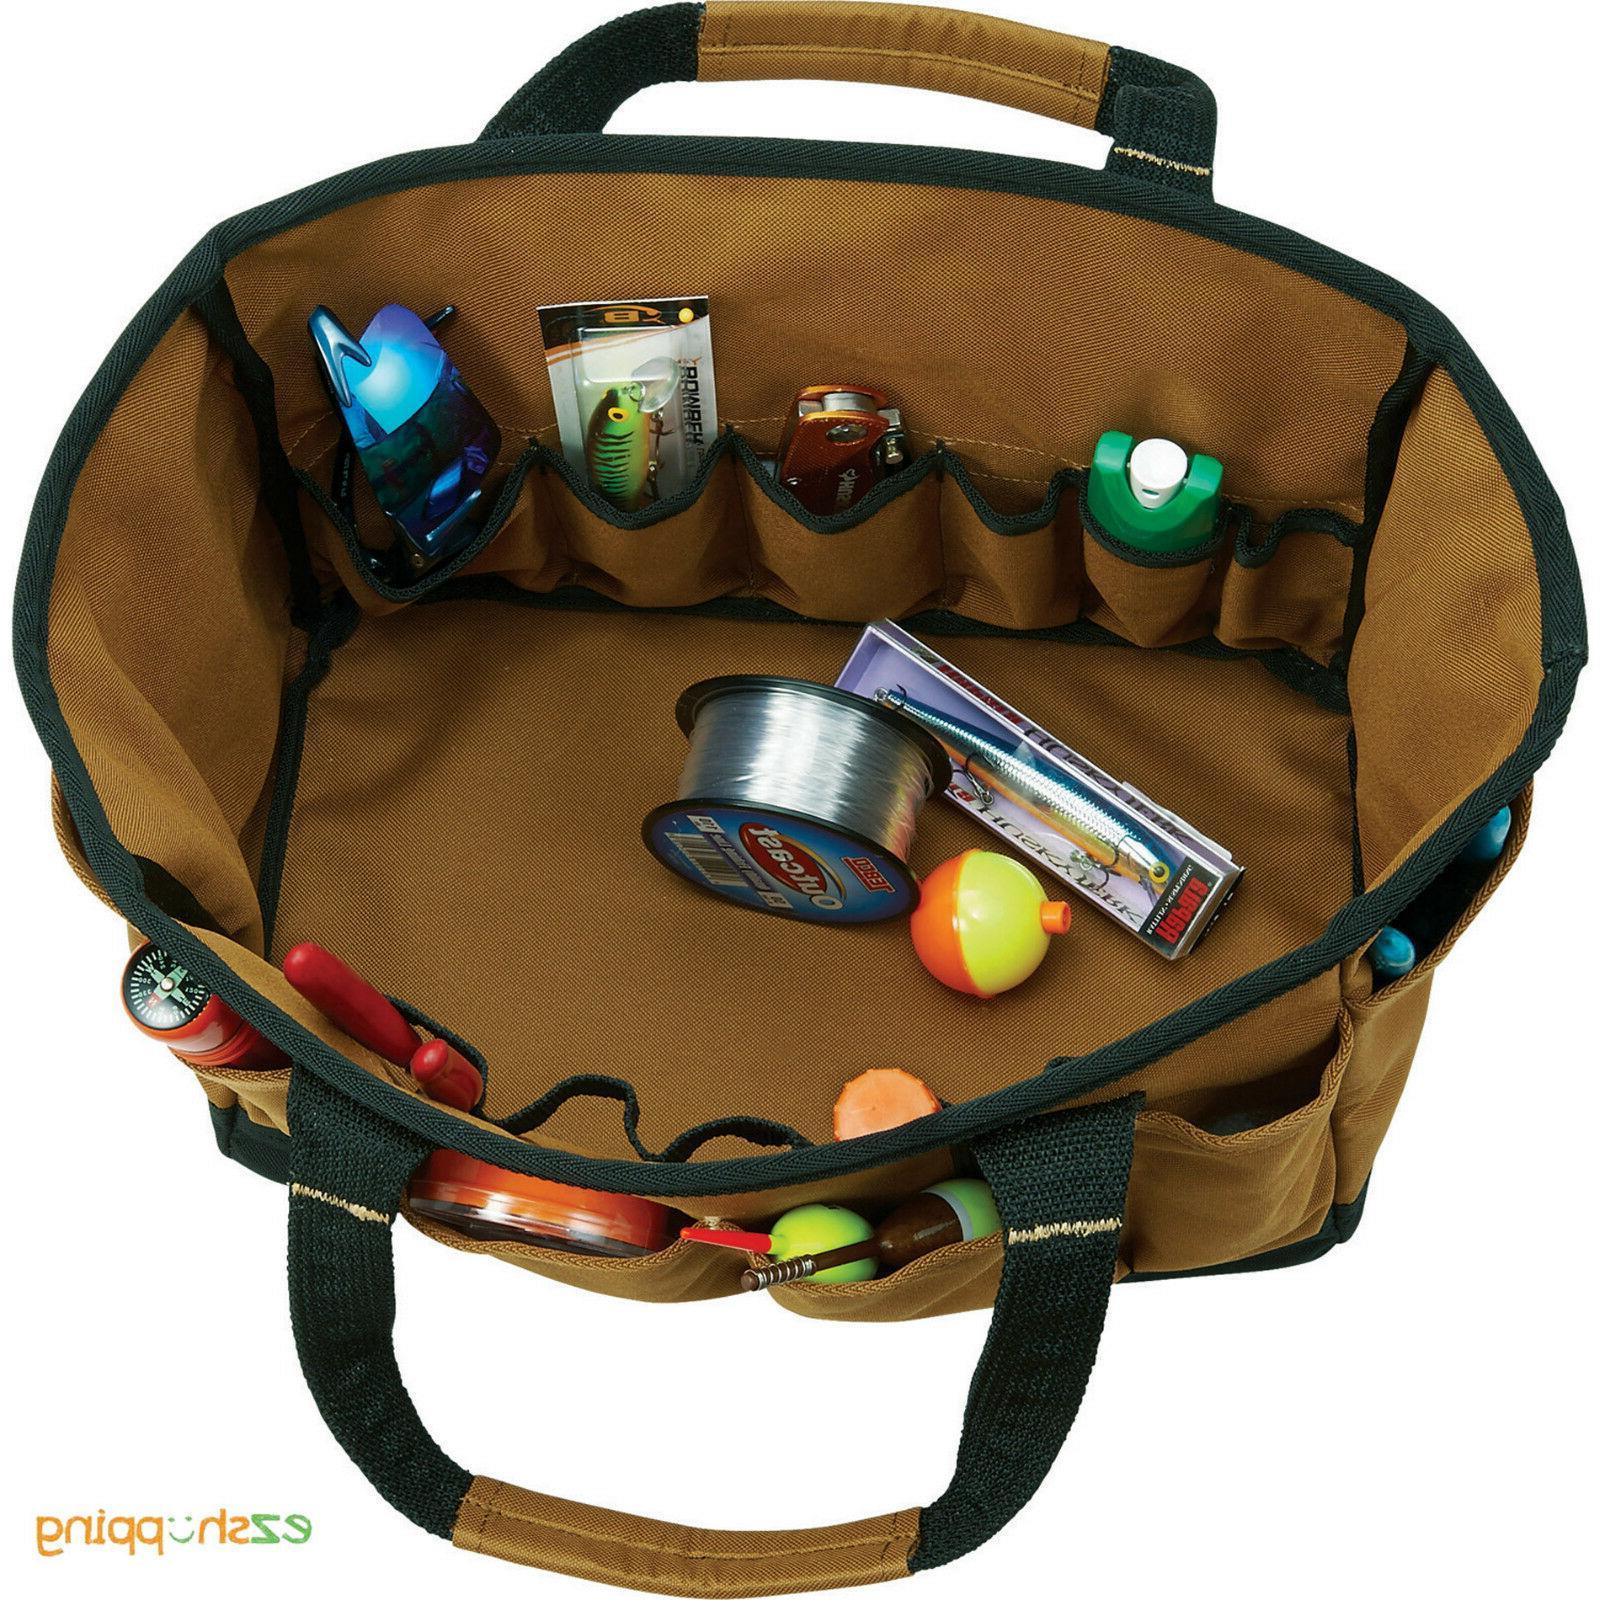 New Tool Tote Bag Free Shipping